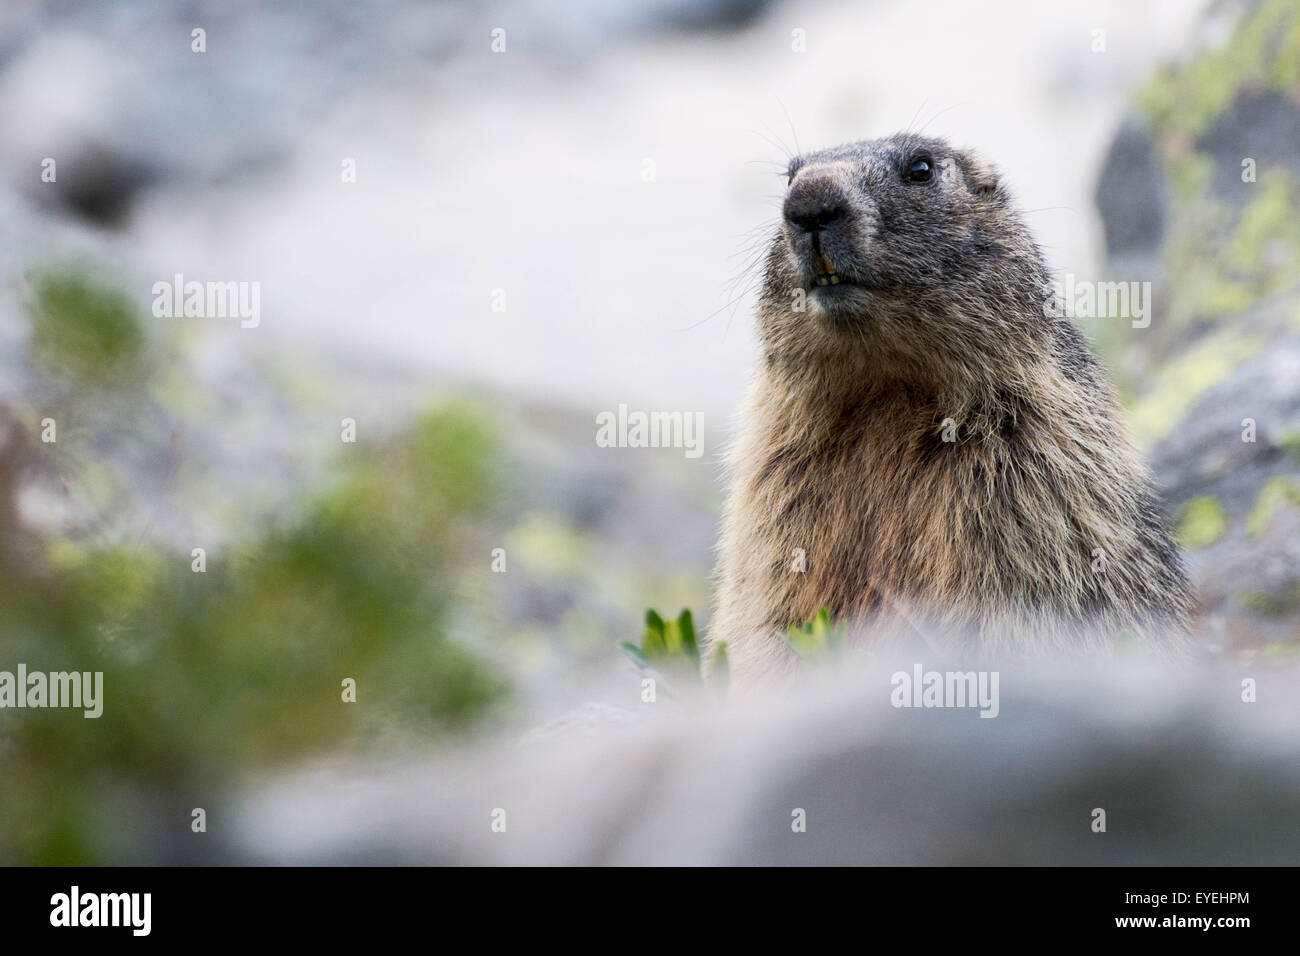 An alpine marmot (Marmota marmota) surveys its surroundings from a high point in the Austrian Alps. - Stock Image